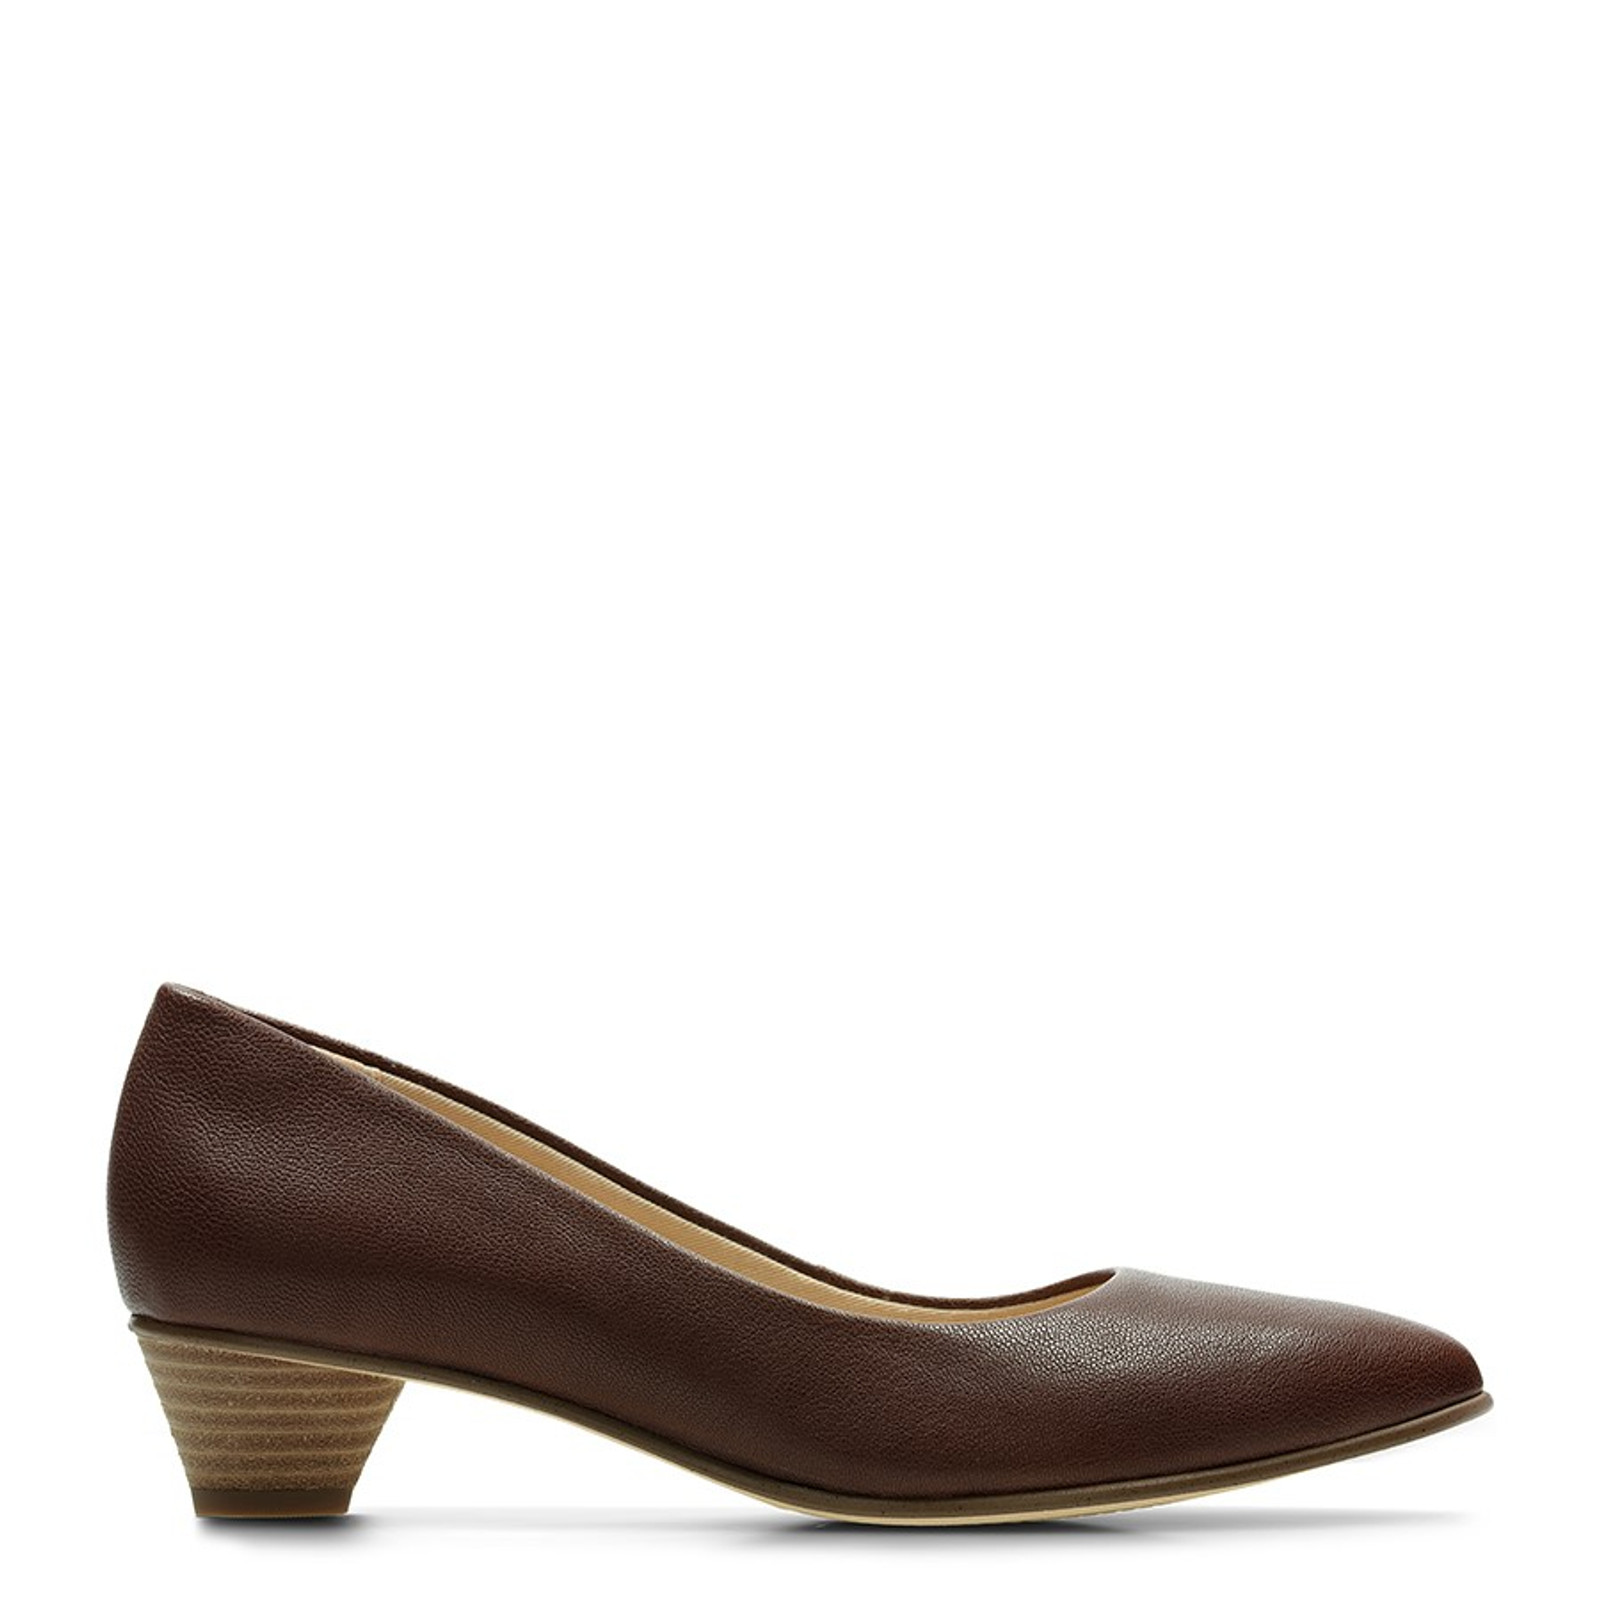 Clarks Womens MENA BLOOM Tan Leather